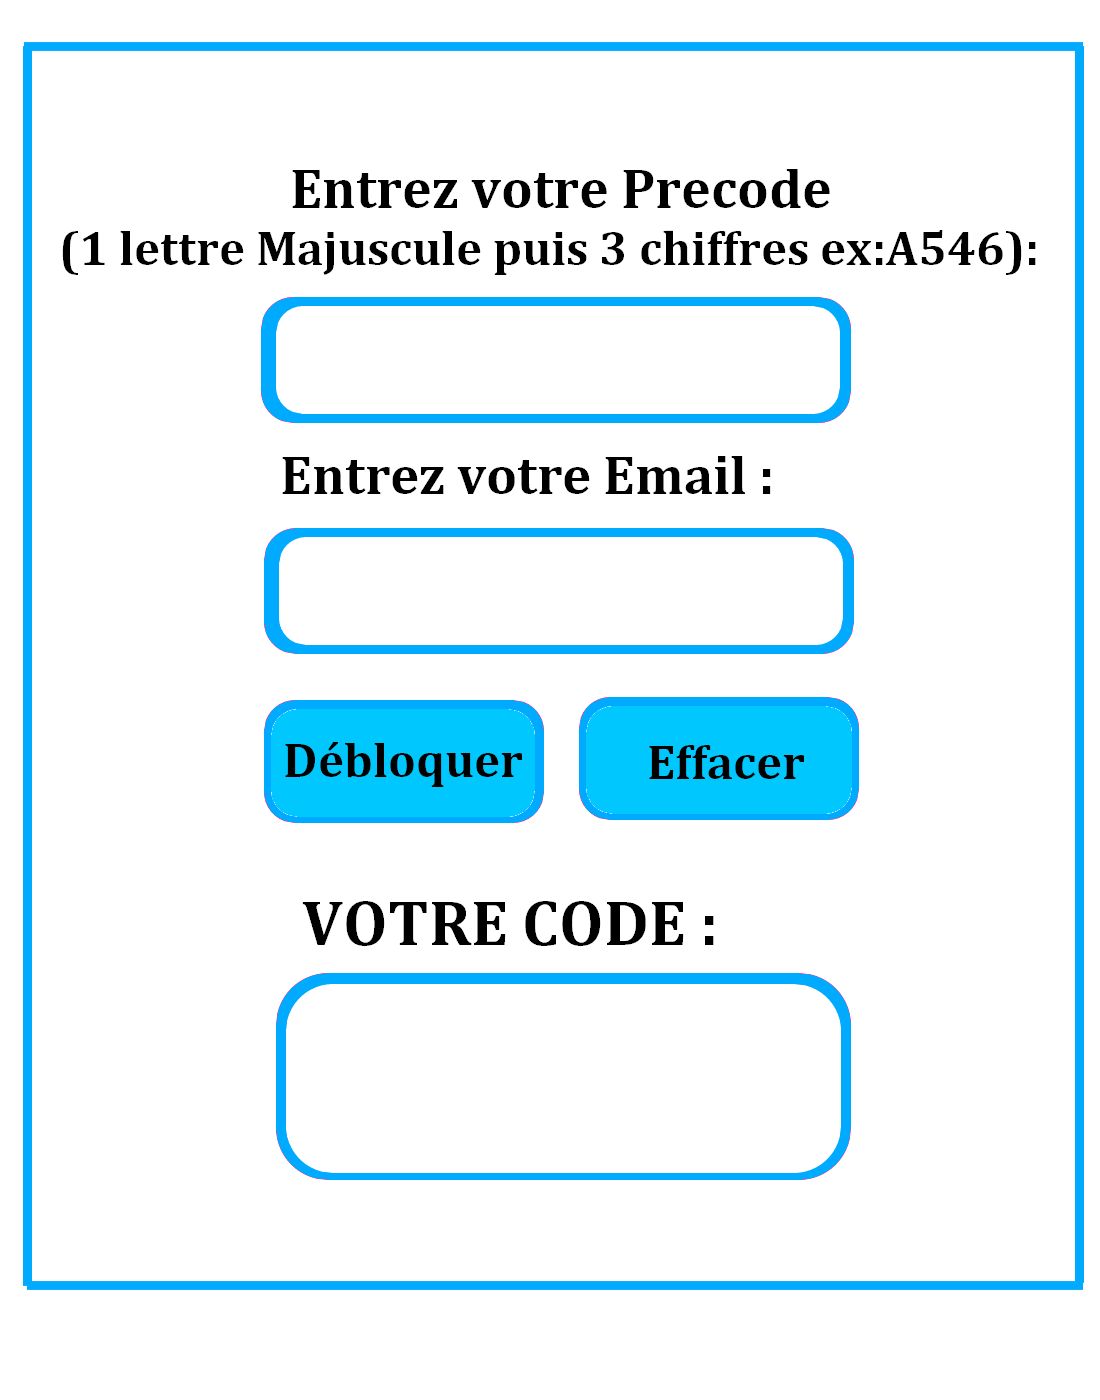 Telecharger Logiciel Code Autoradio Renault Gratuit : telecharger, logiciel, autoradio, renault, gratuit, Reanult, Radio, Radios,, Effacer,, Lettres, Majuscules